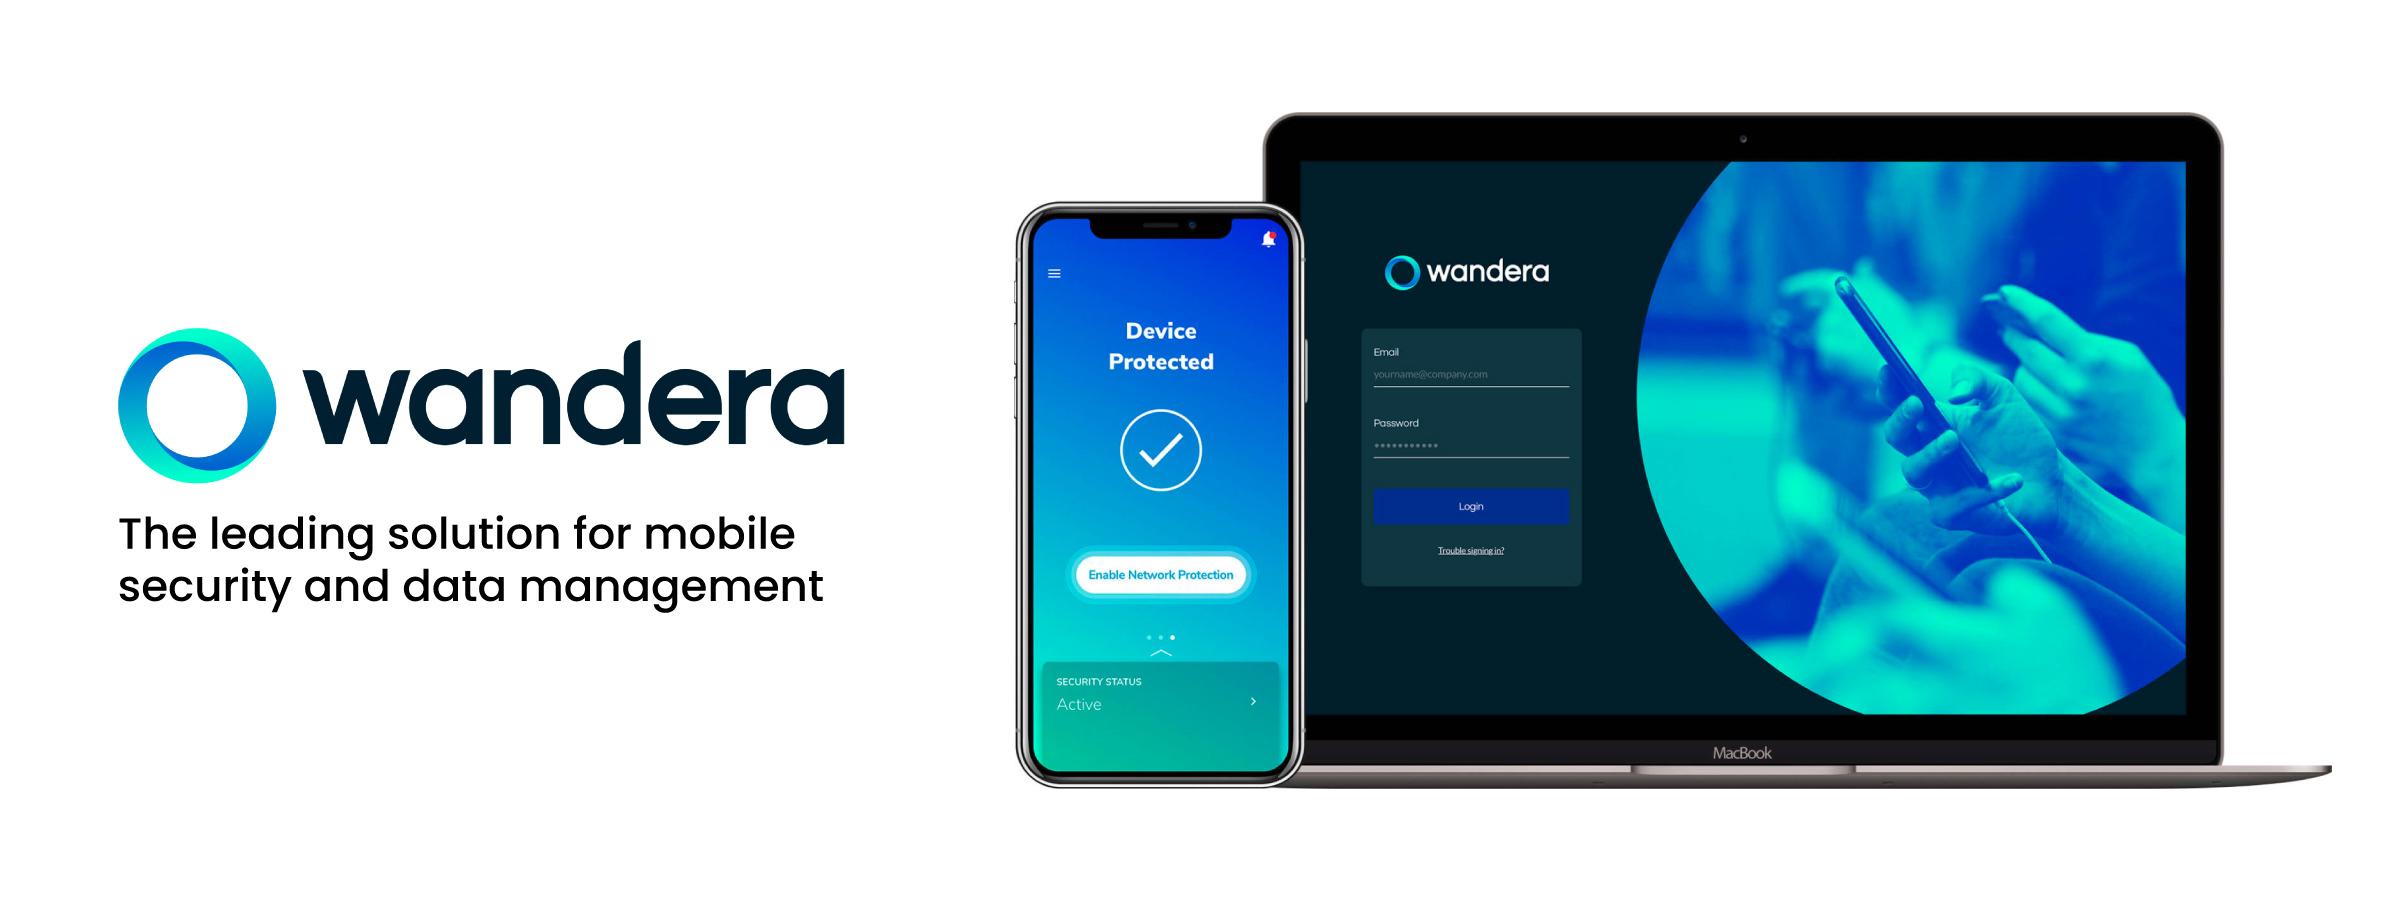 Wandera Mobile Security